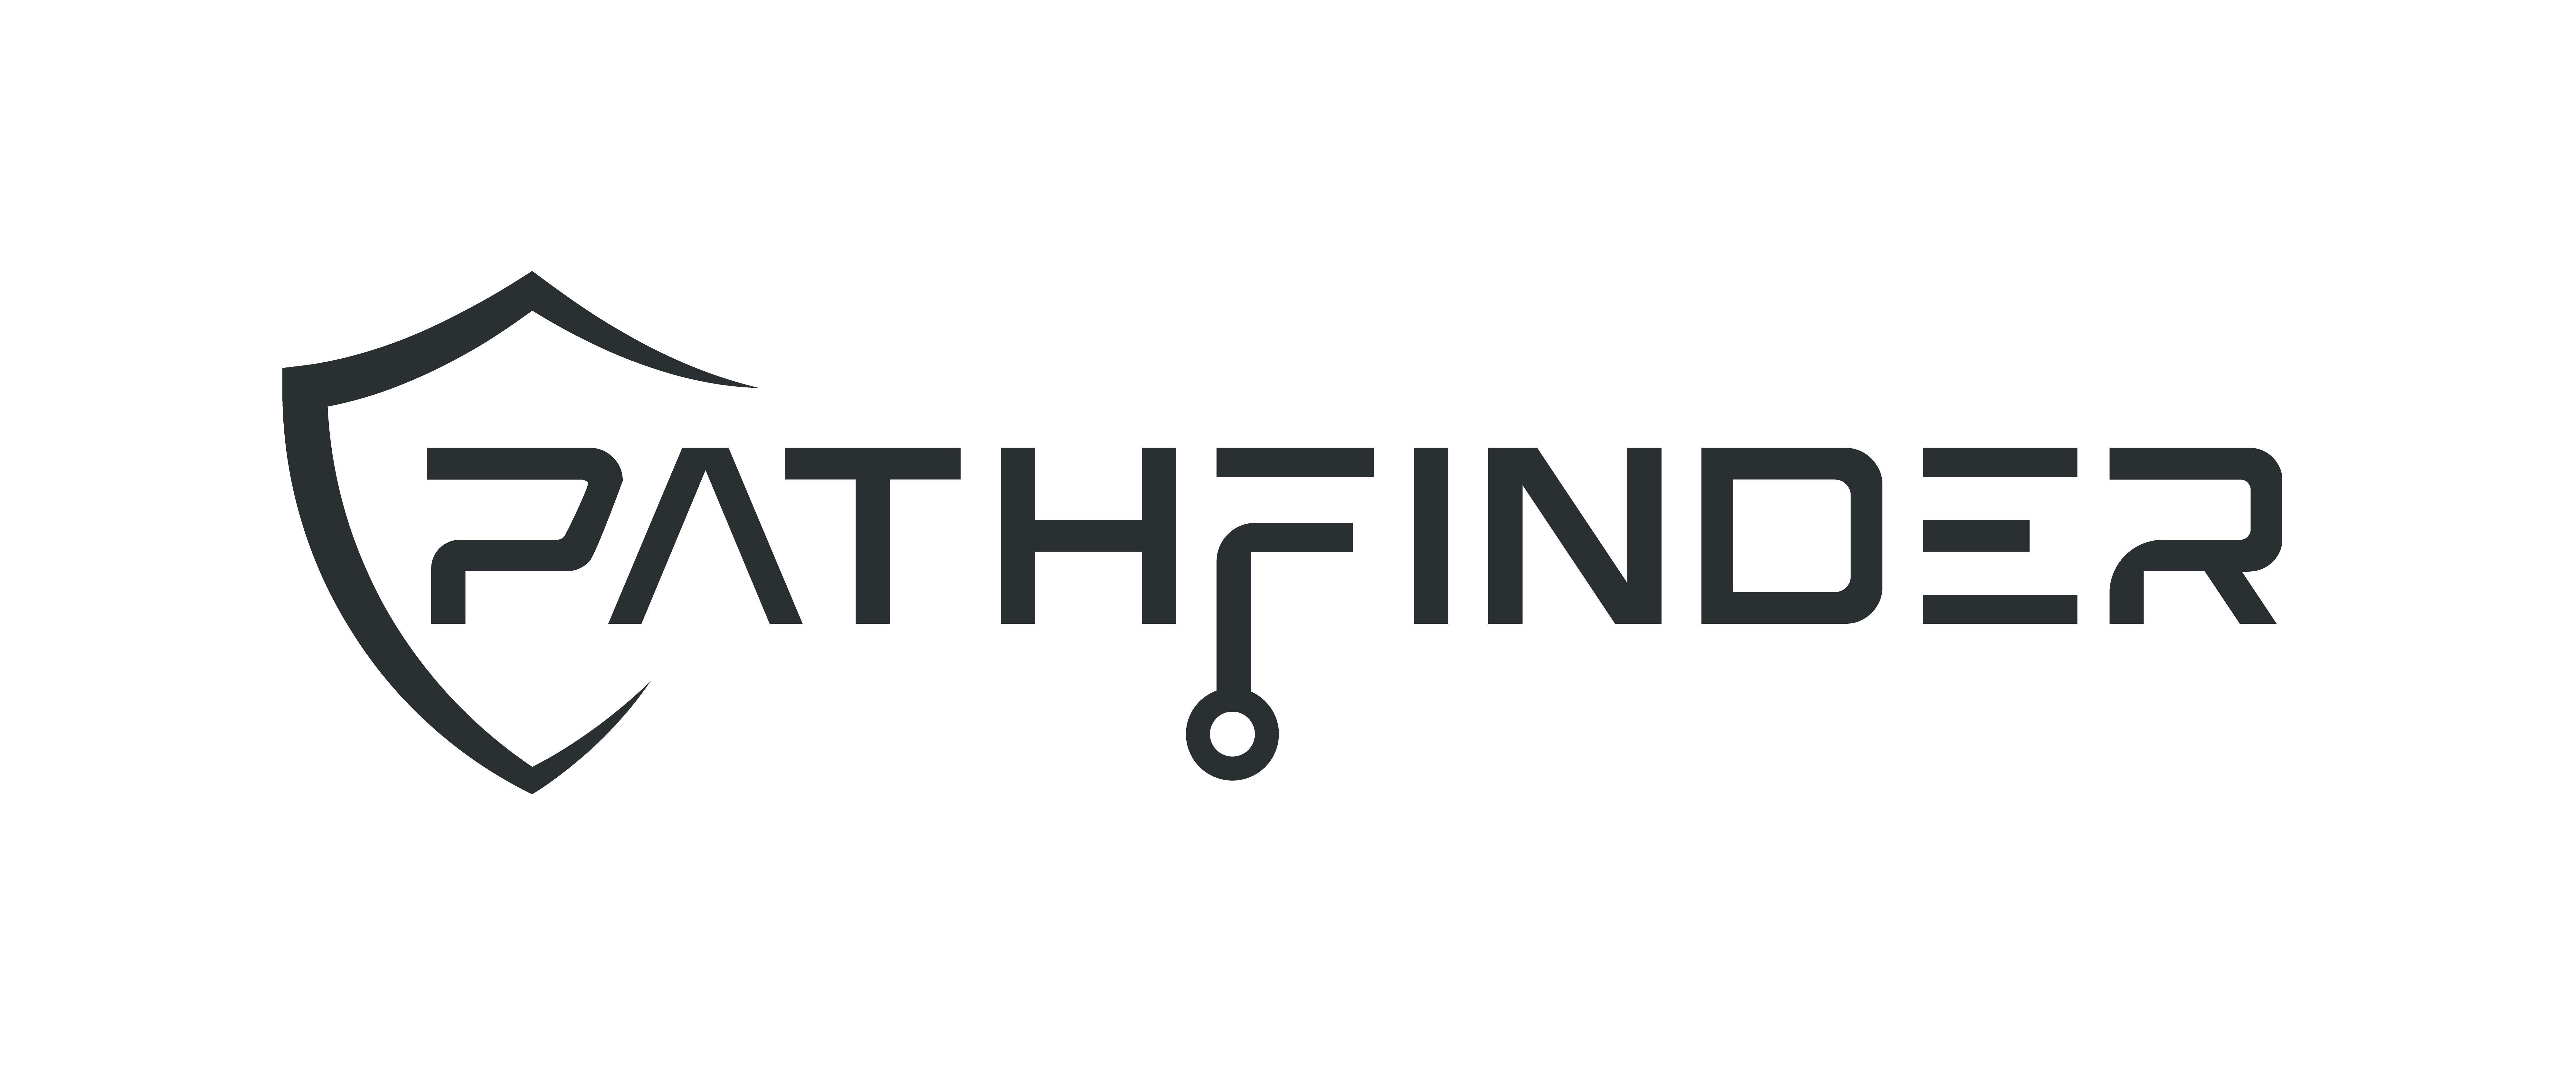 New Tech Platform logo needed!